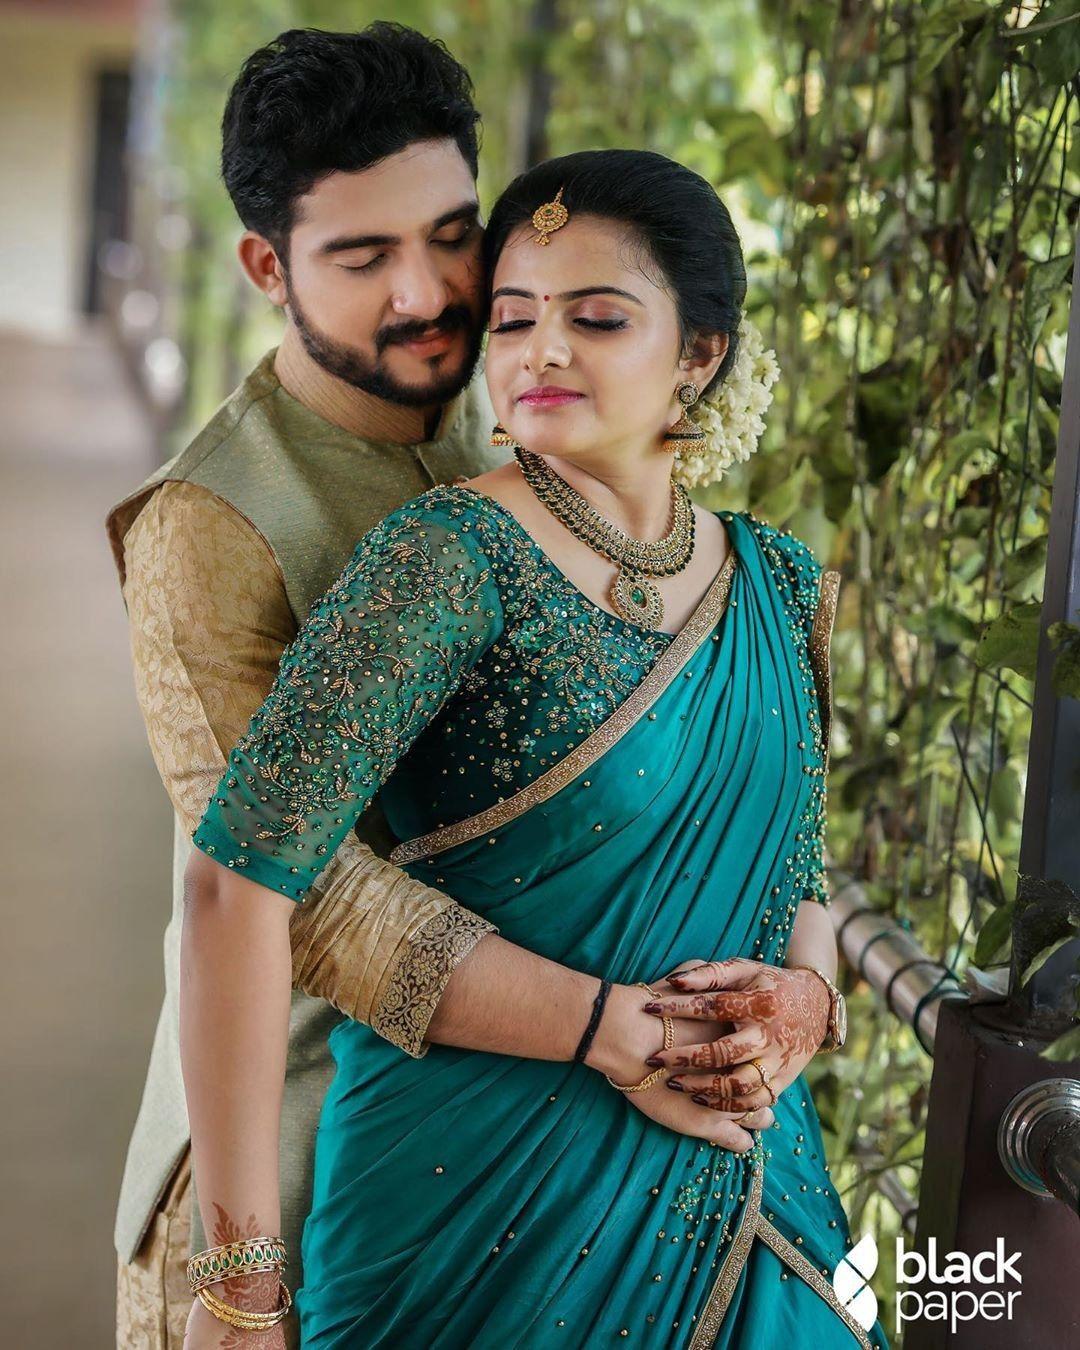 Pin By Gaurav Mavani On Couple S Costumes Pre Wedding Photoshoot Outfit Indian Wedding Couple Photography Kerala Wedding Photography